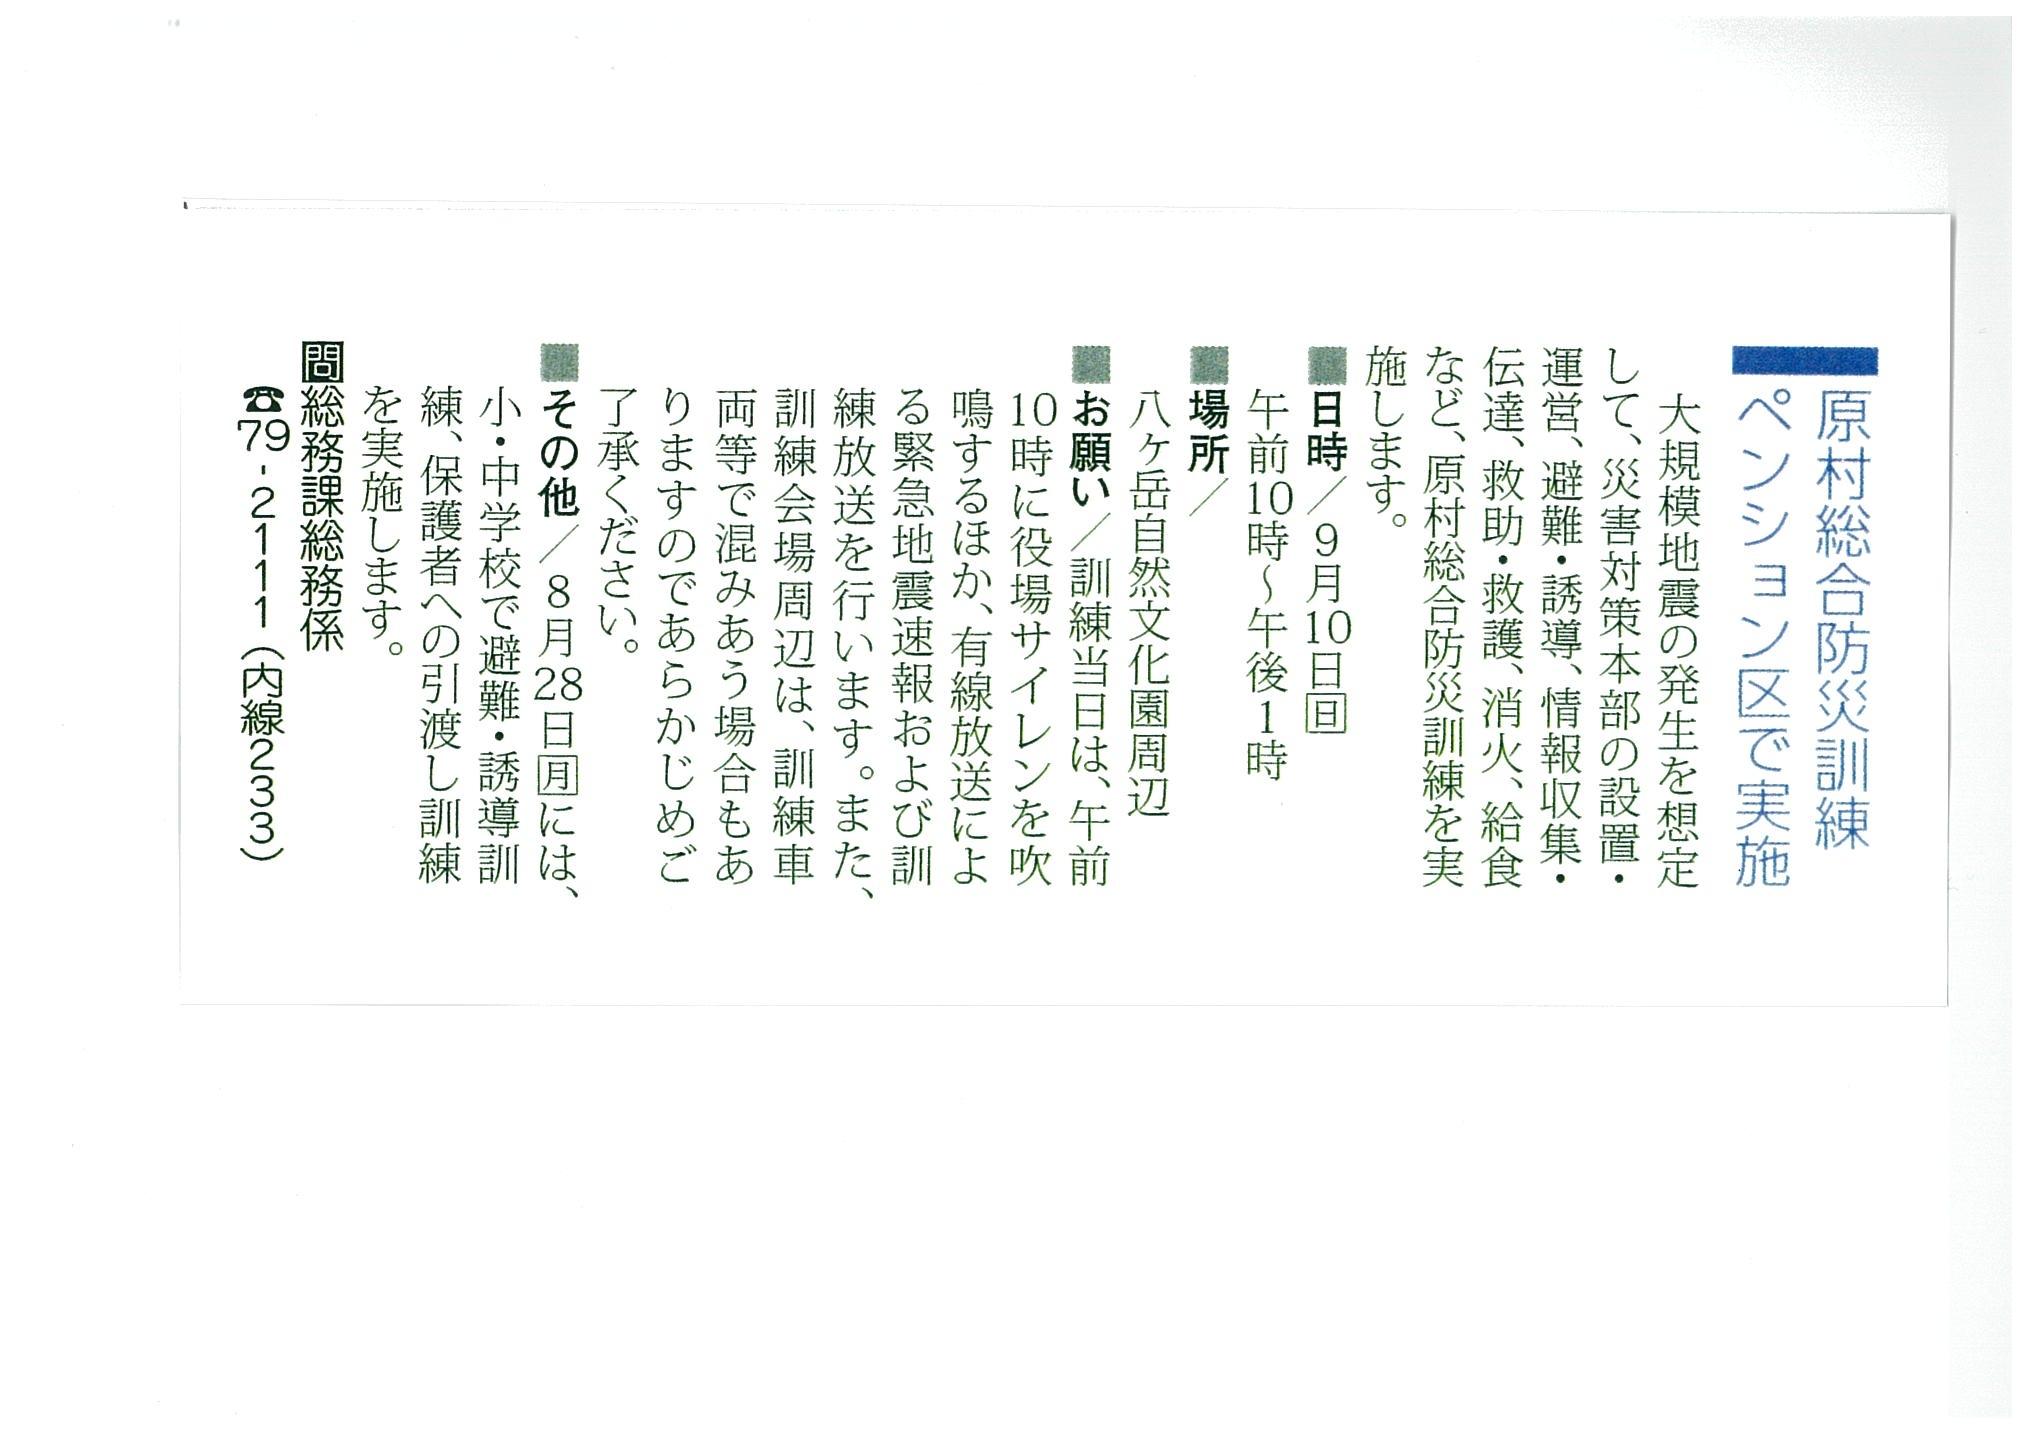 http://www.alpico.co.jp/shikinomori/news/images/4222ebe4a84e010126d57000c085b3711e347392.jpg